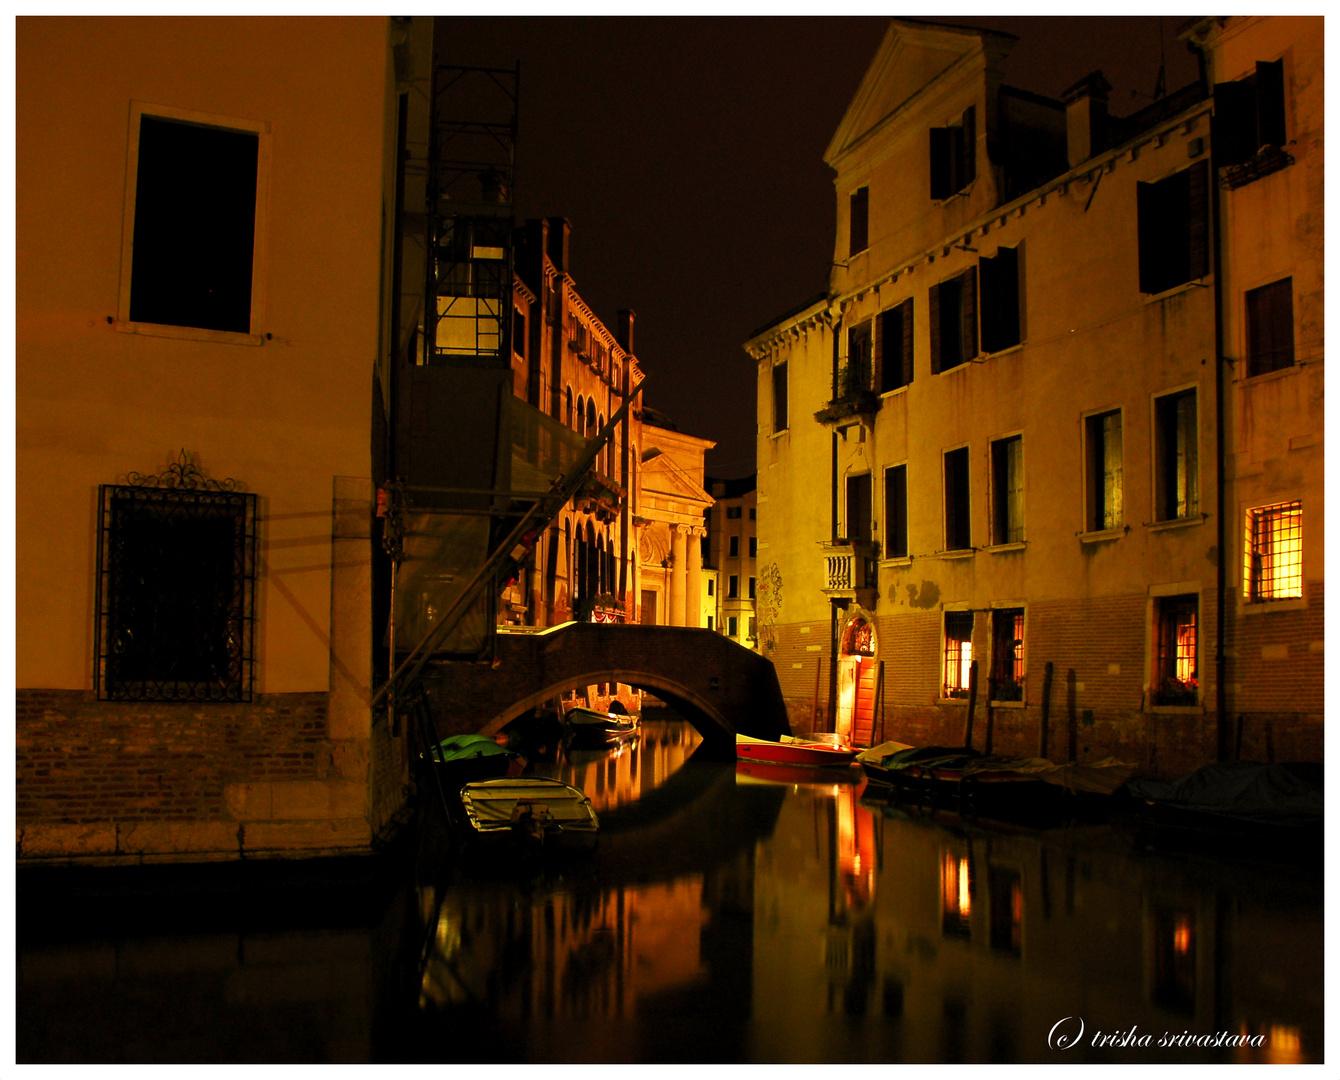 A Night in Venice